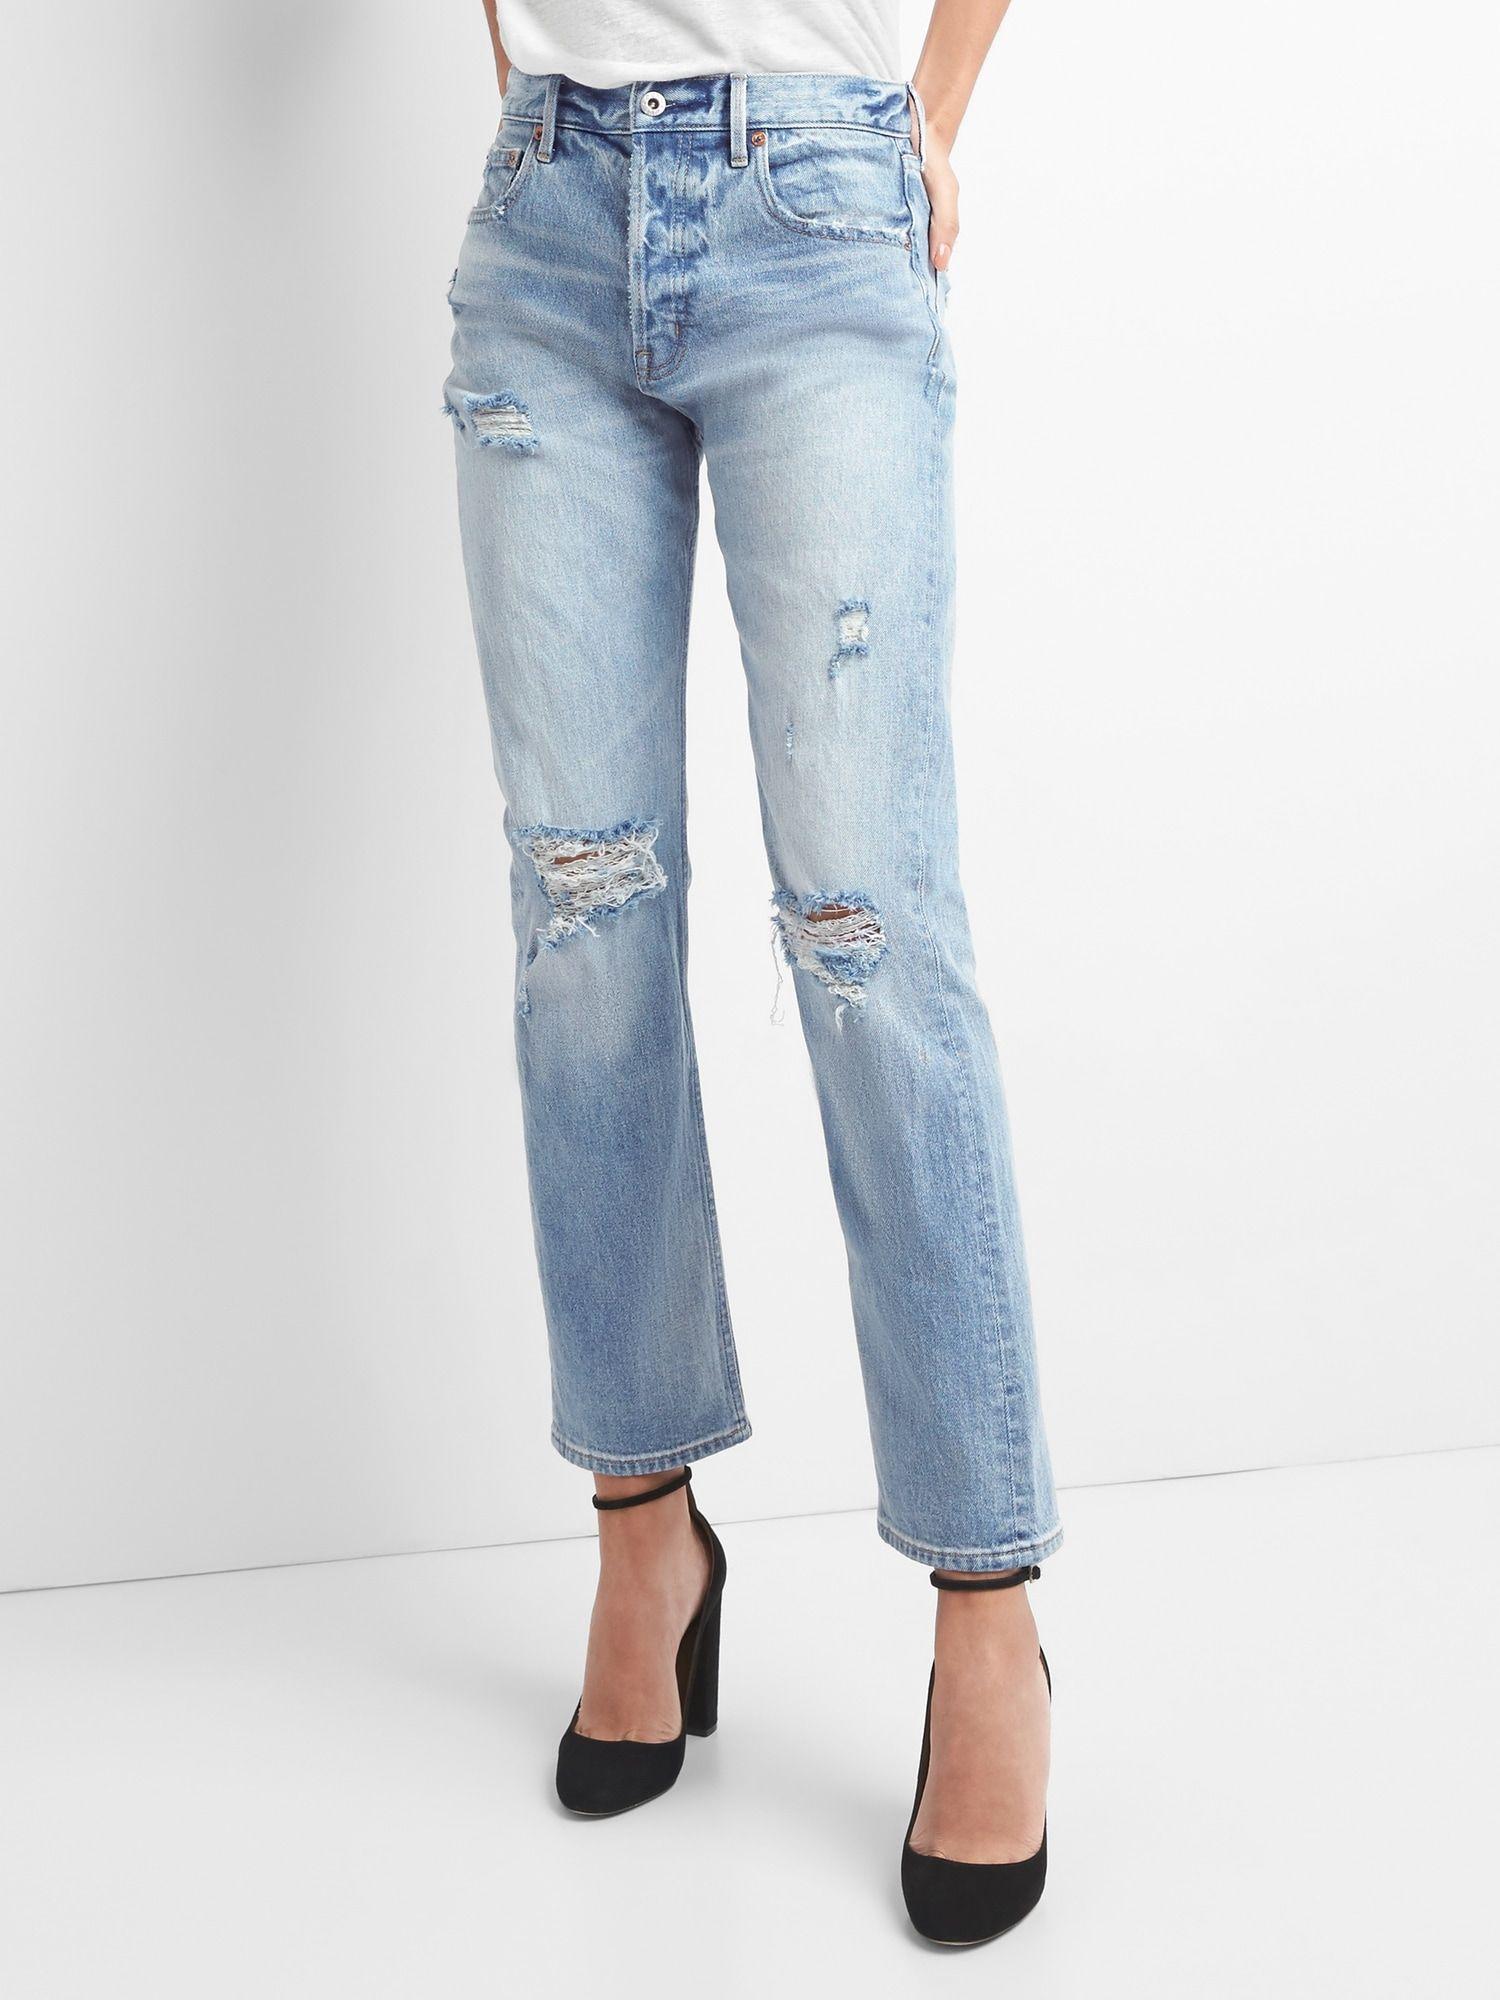 1fb367b1fa Cone Denim® Super High Rise Straight Jeans with Destruction|gap ...